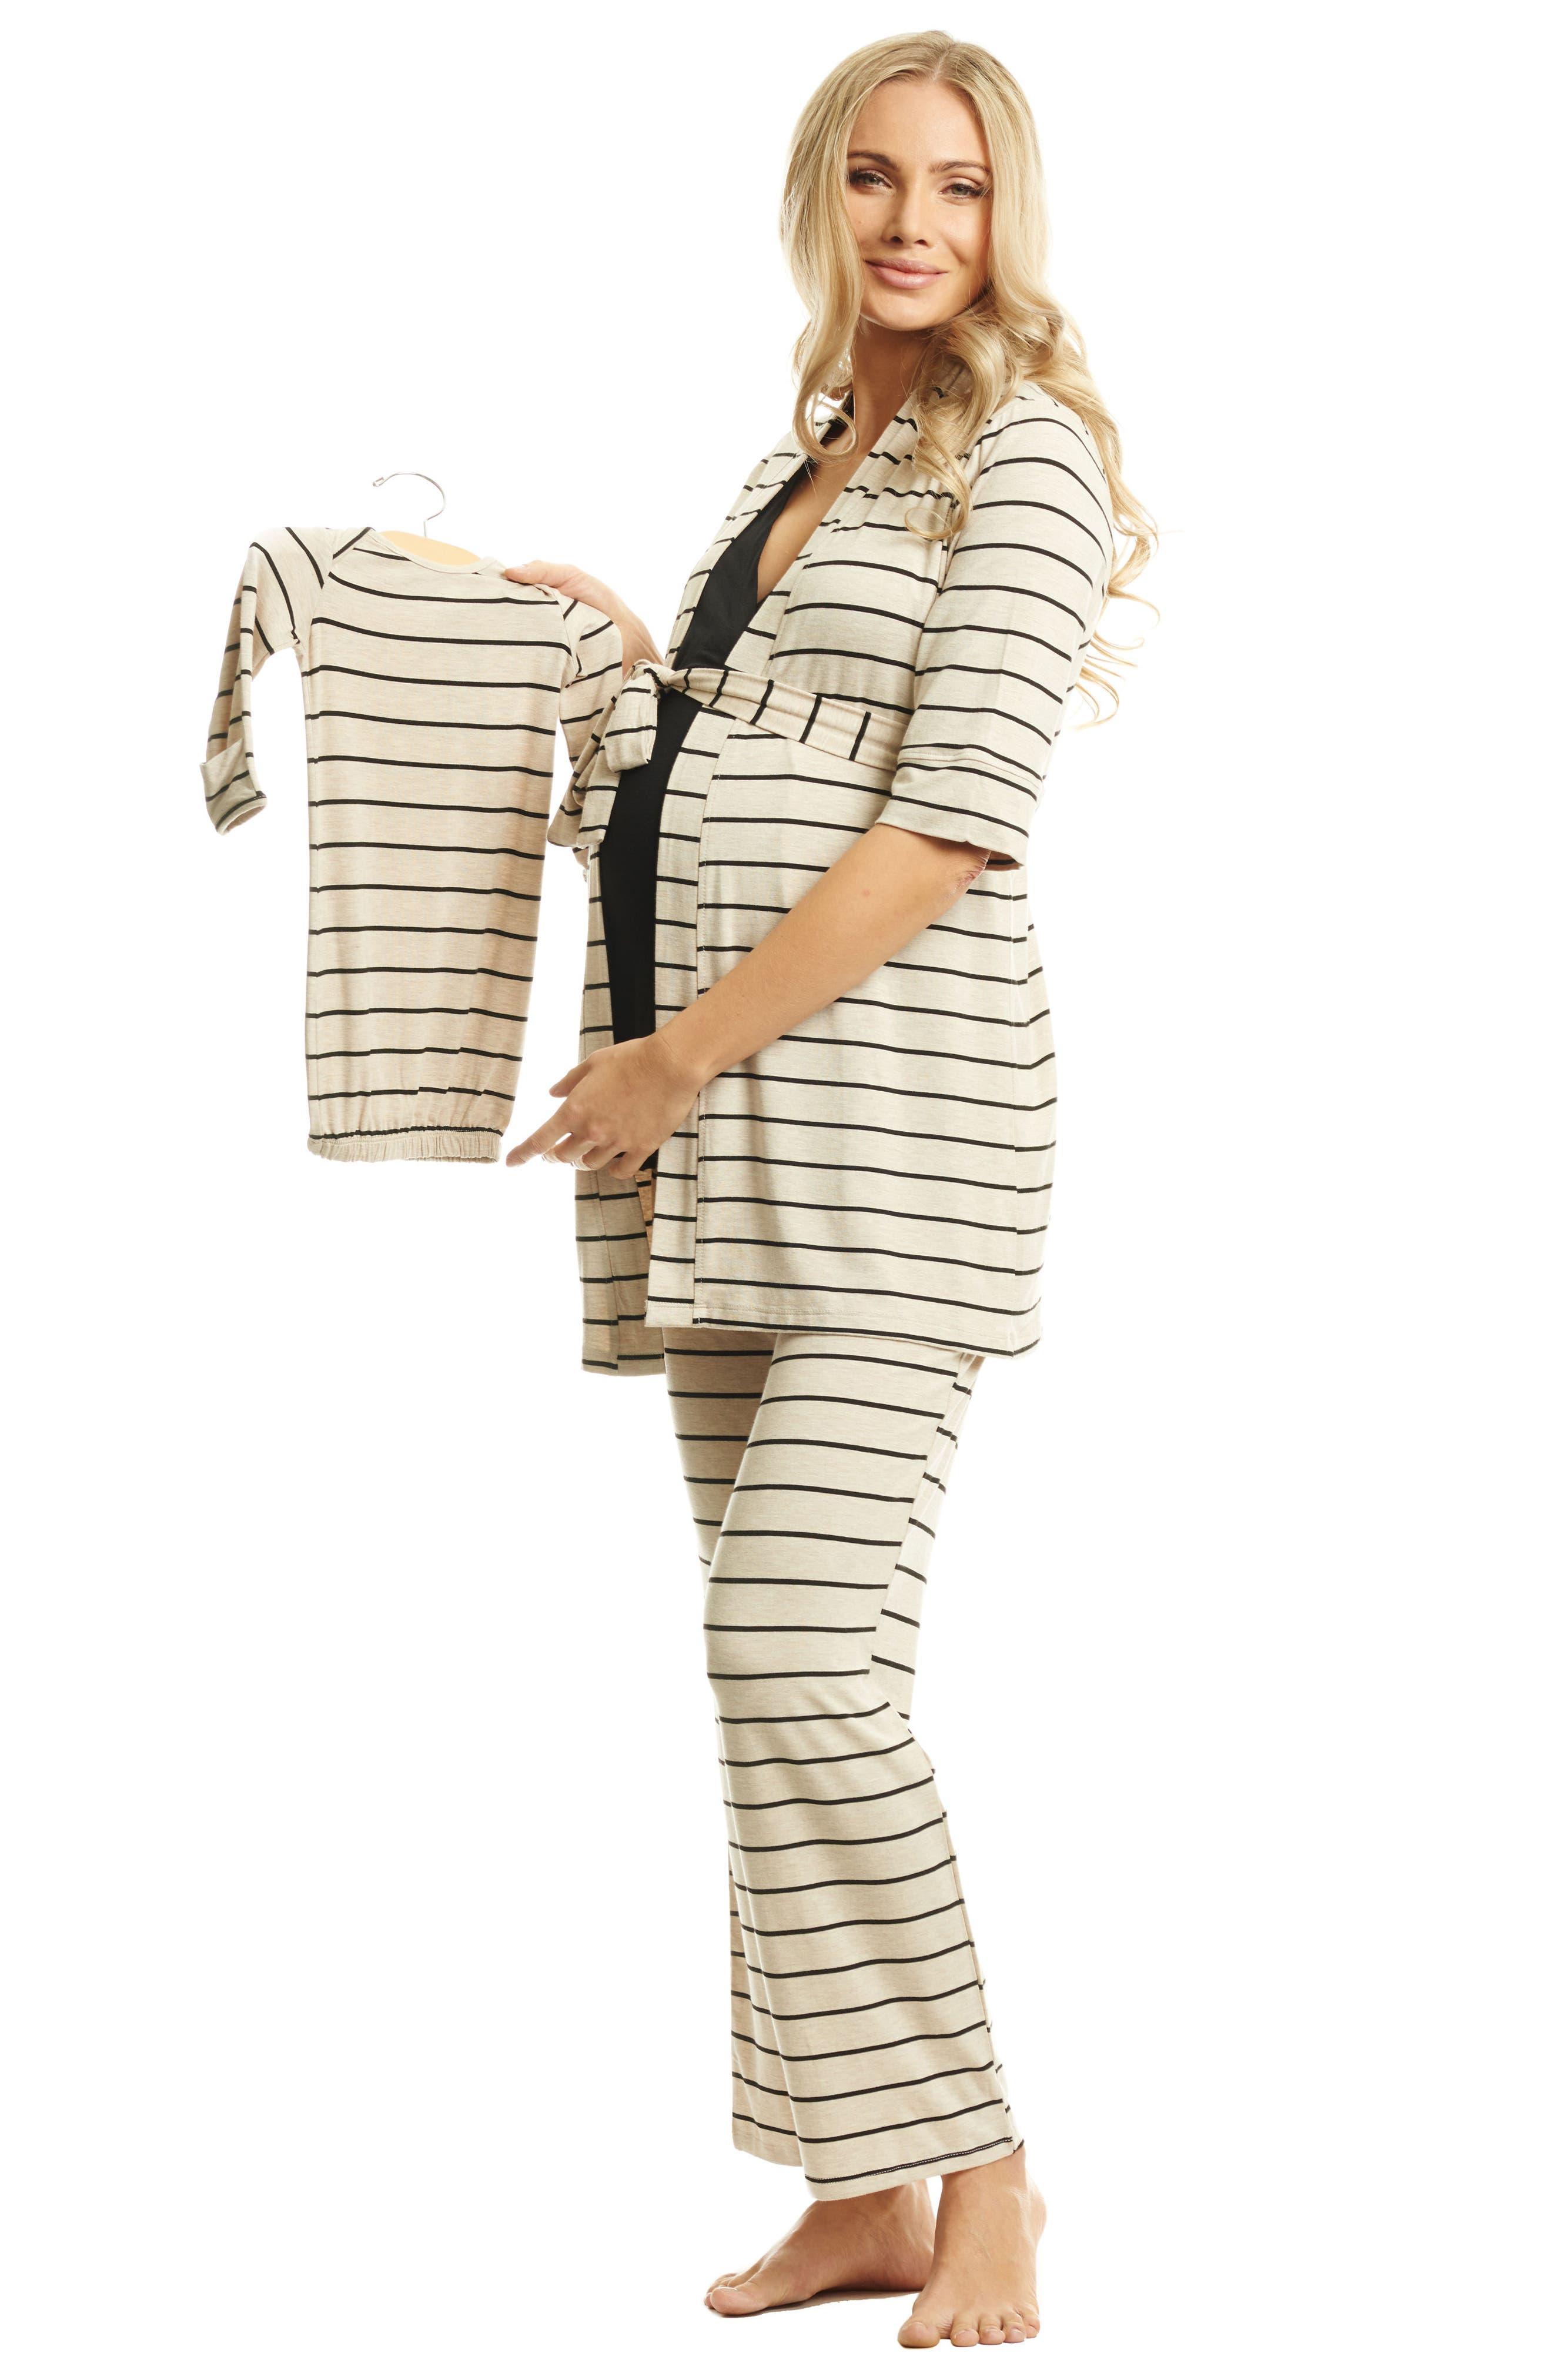 Roxanne - During & After 5-Piece Maternity Sleepwear Set,                             Alternate thumbnail 7, color,                             SAND STRIPE